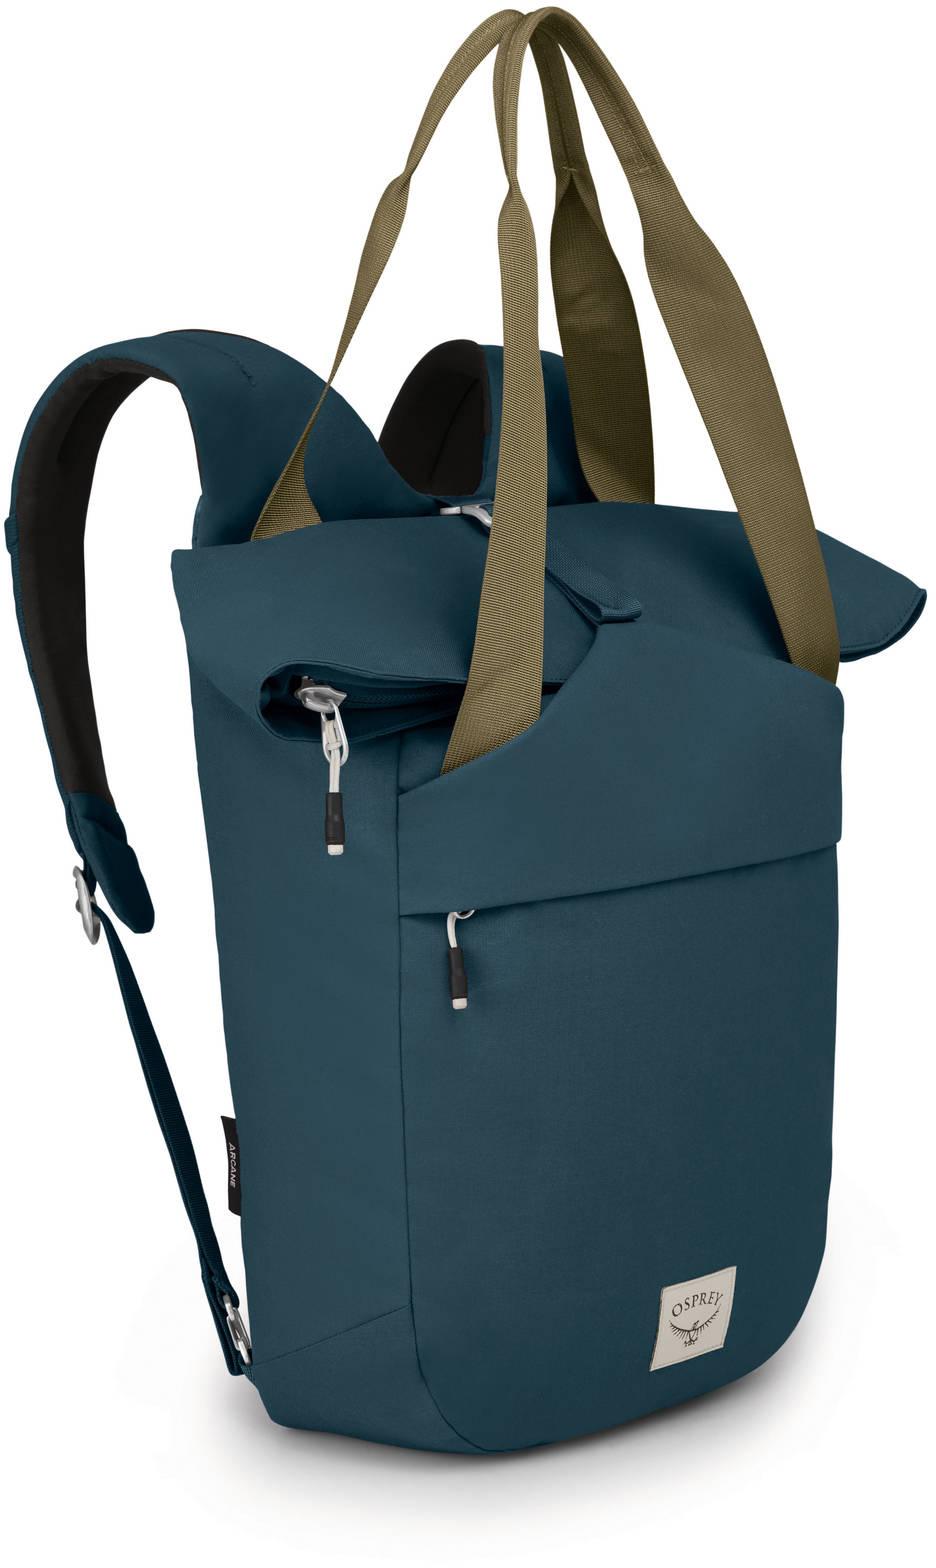 Городские рюкзаки Рюкзак сумка Osprey Arcane Tote Stargazer Blue Arcane_Tote_Pack_S20_Side_Stargazer_Blue_web.jpg